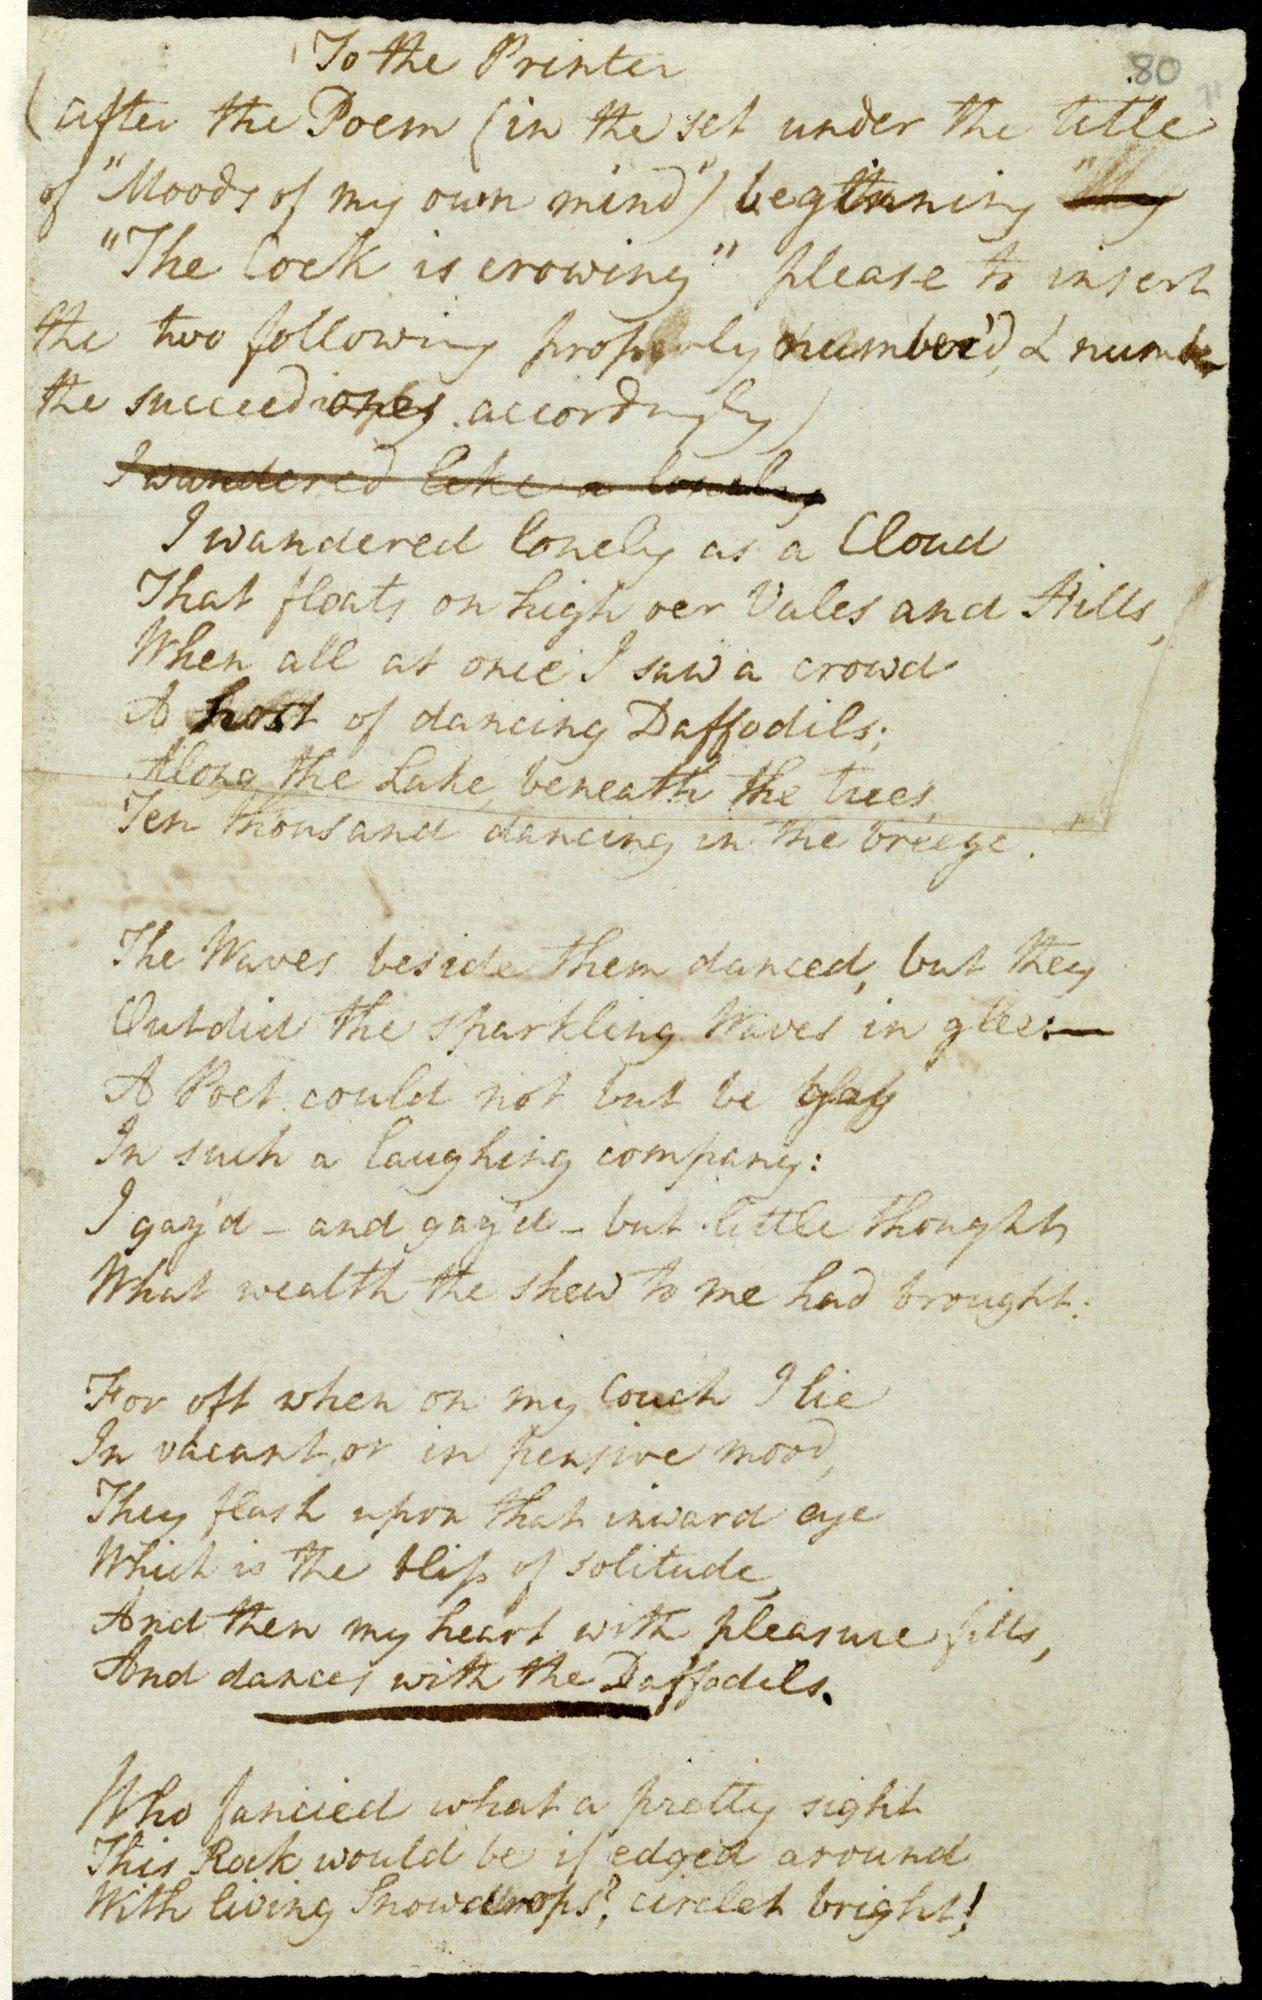 wordsworth daffodils  transcript wordsworth i wandered lonely as a cloud